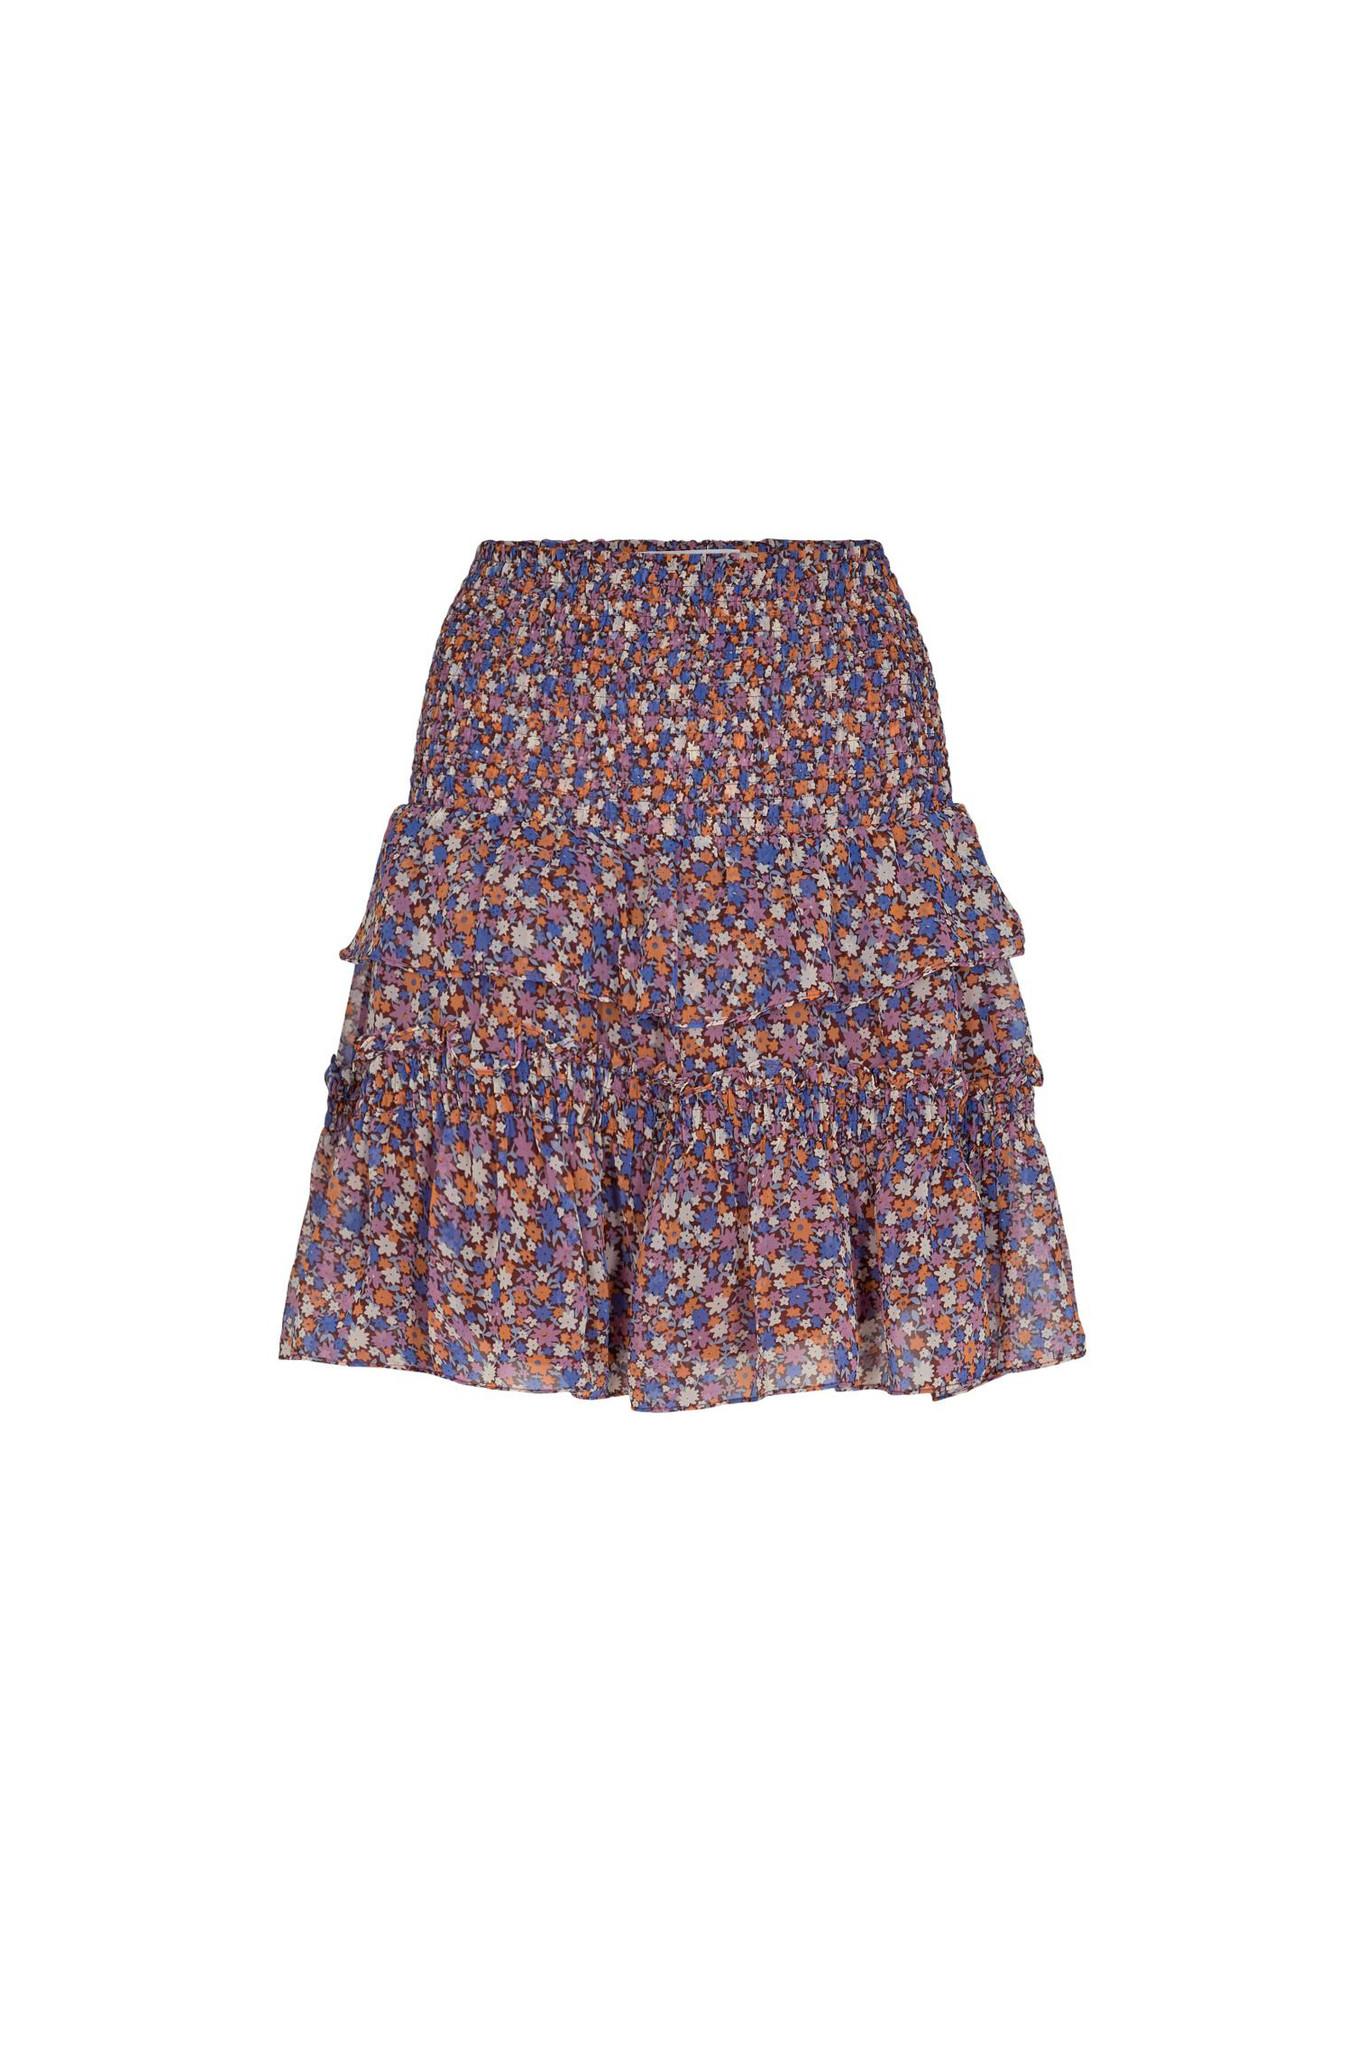 Amore Flower Smock Skirt - Purple-1